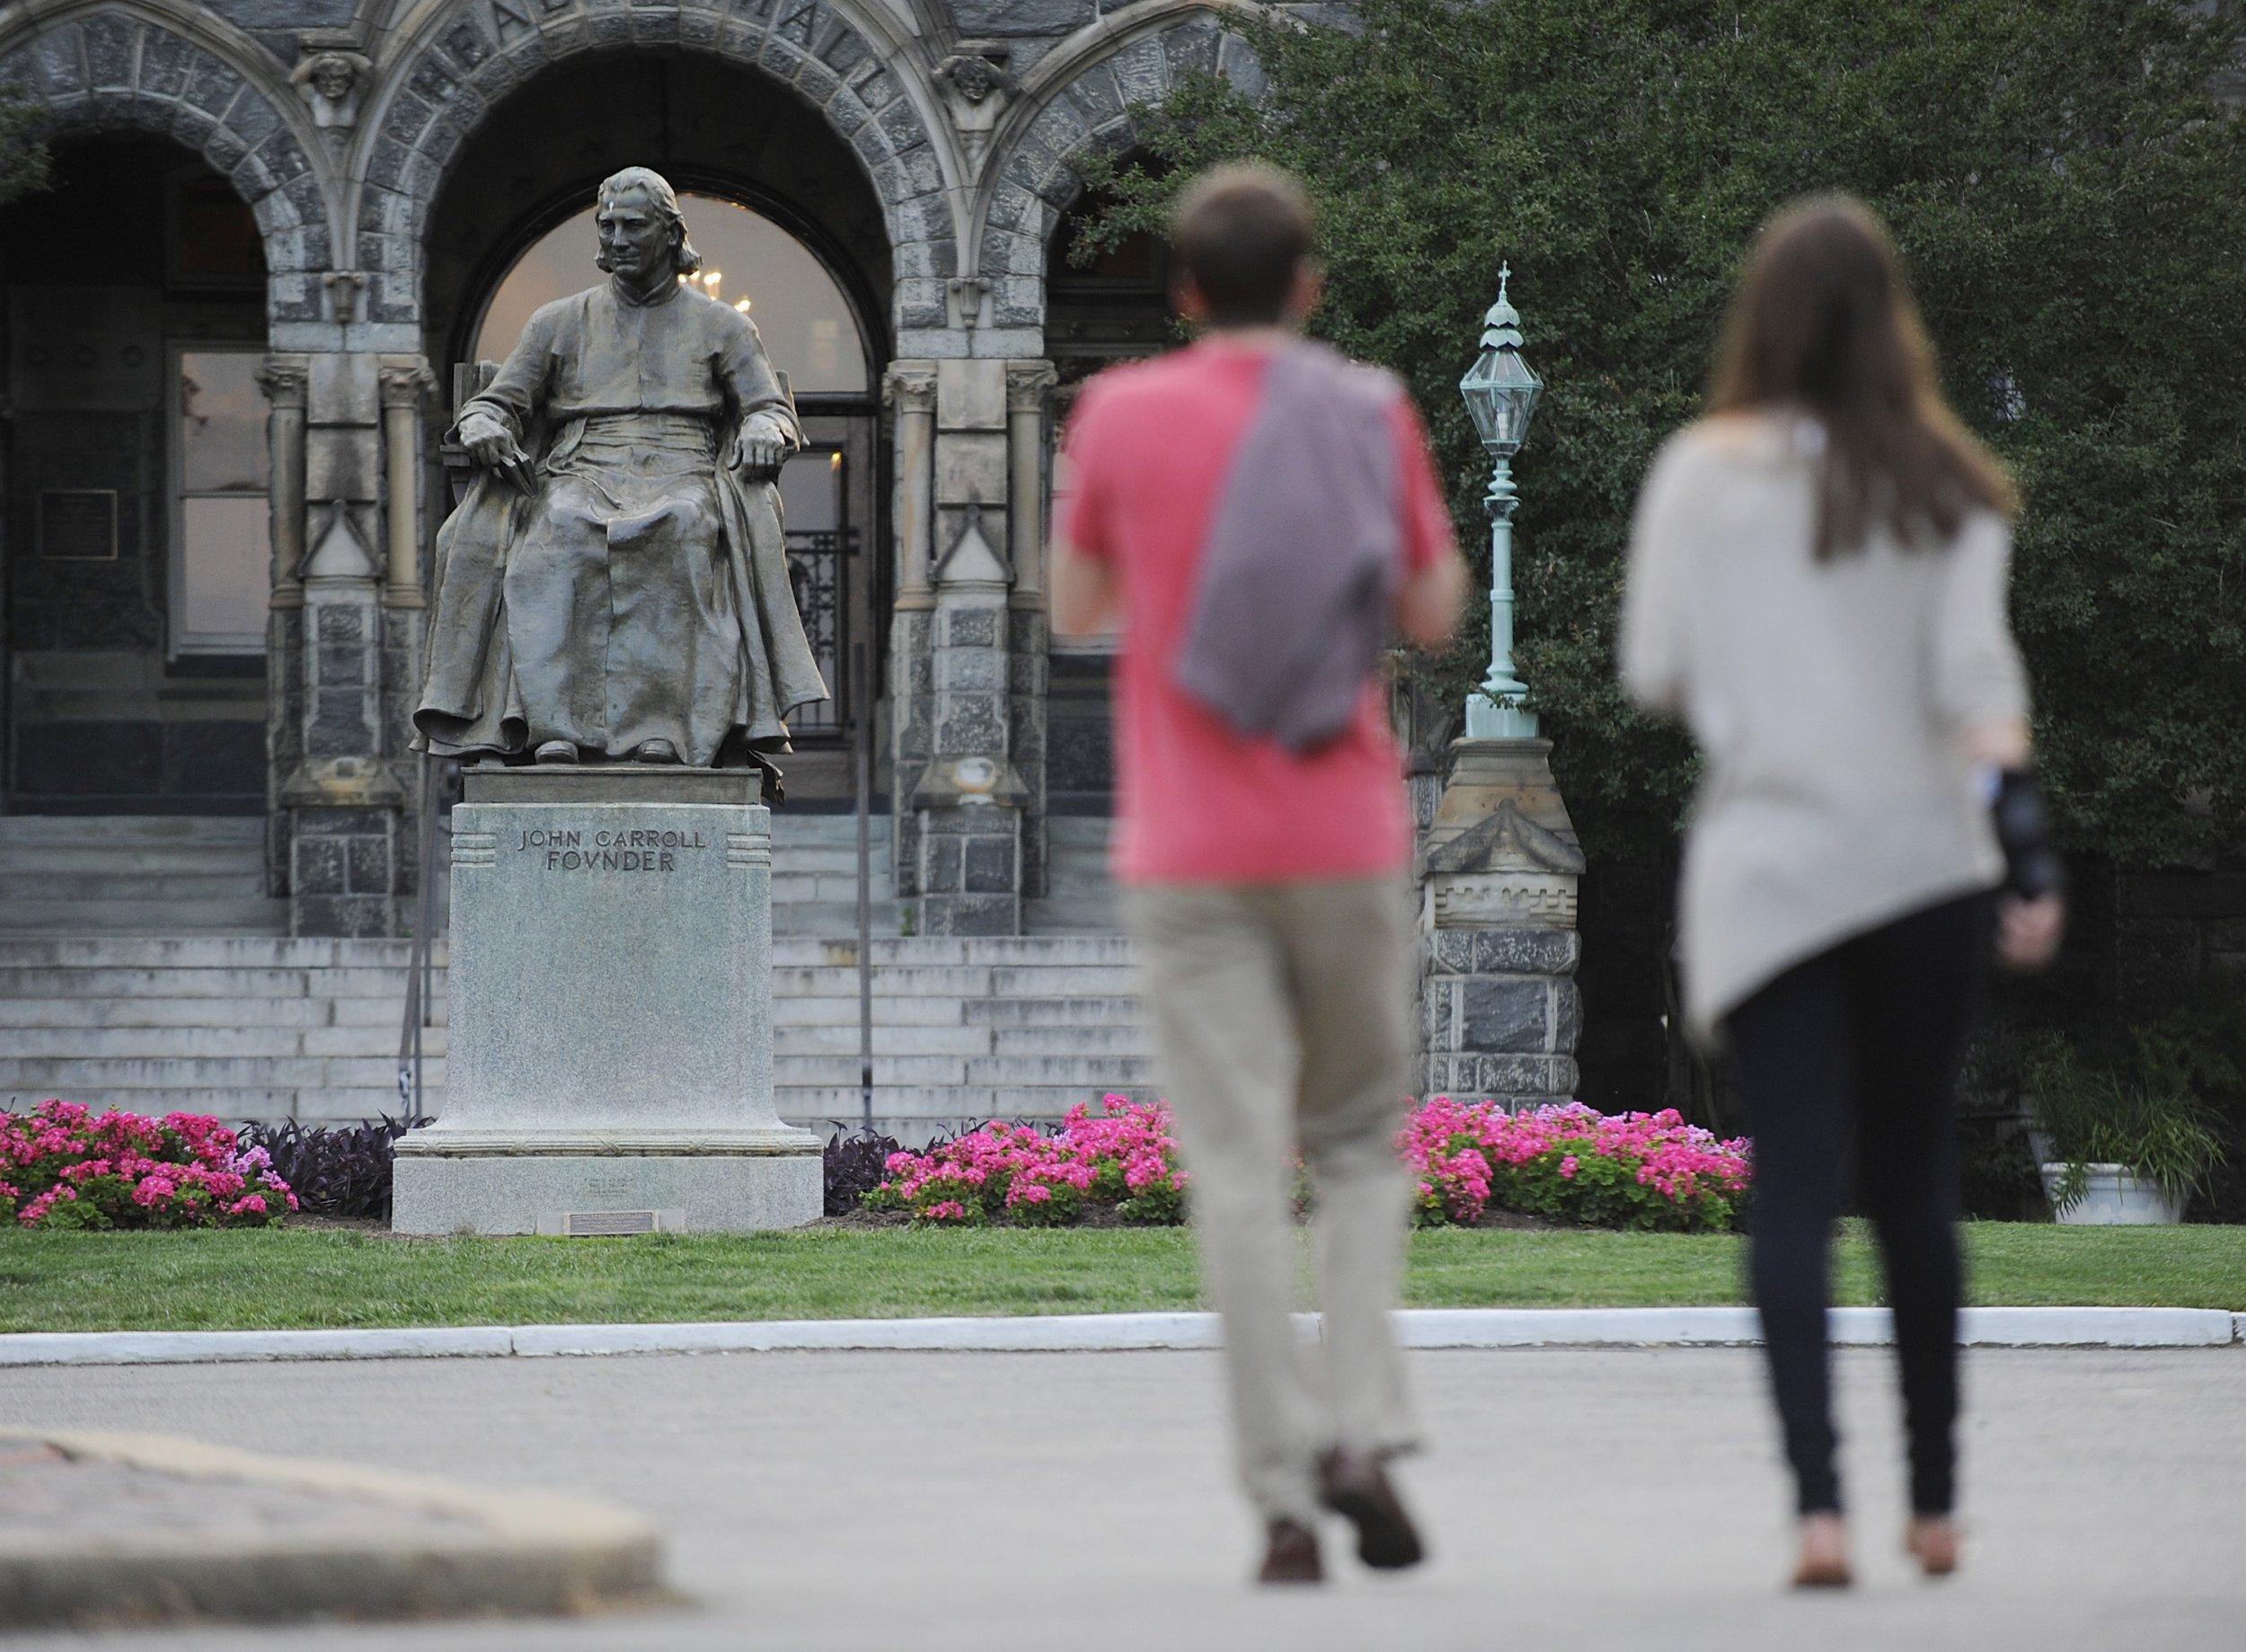 0923_Catholic Universities Funding Poor Students